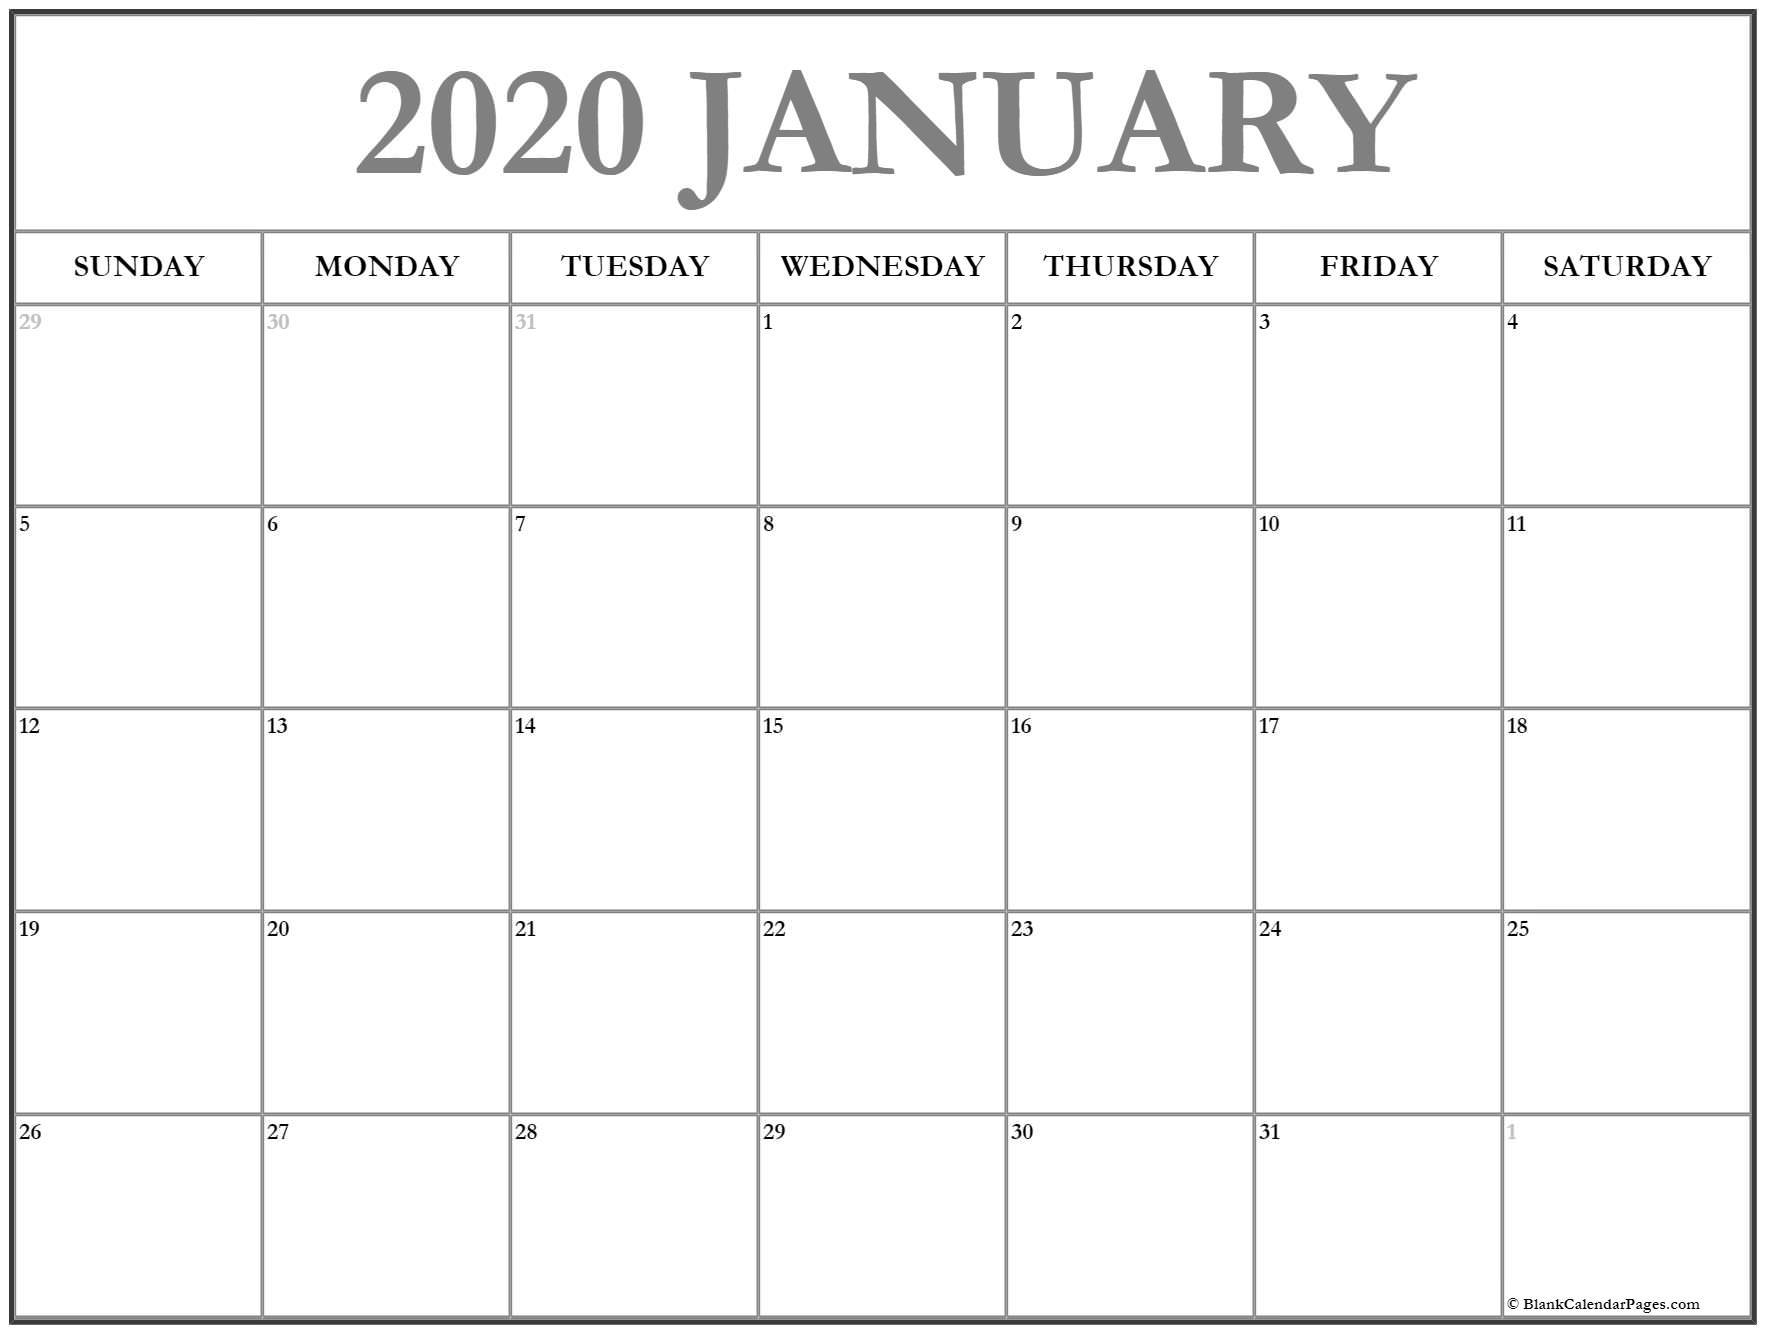 January 2020 Calendar | 56+ Templates Of 2020 Printable